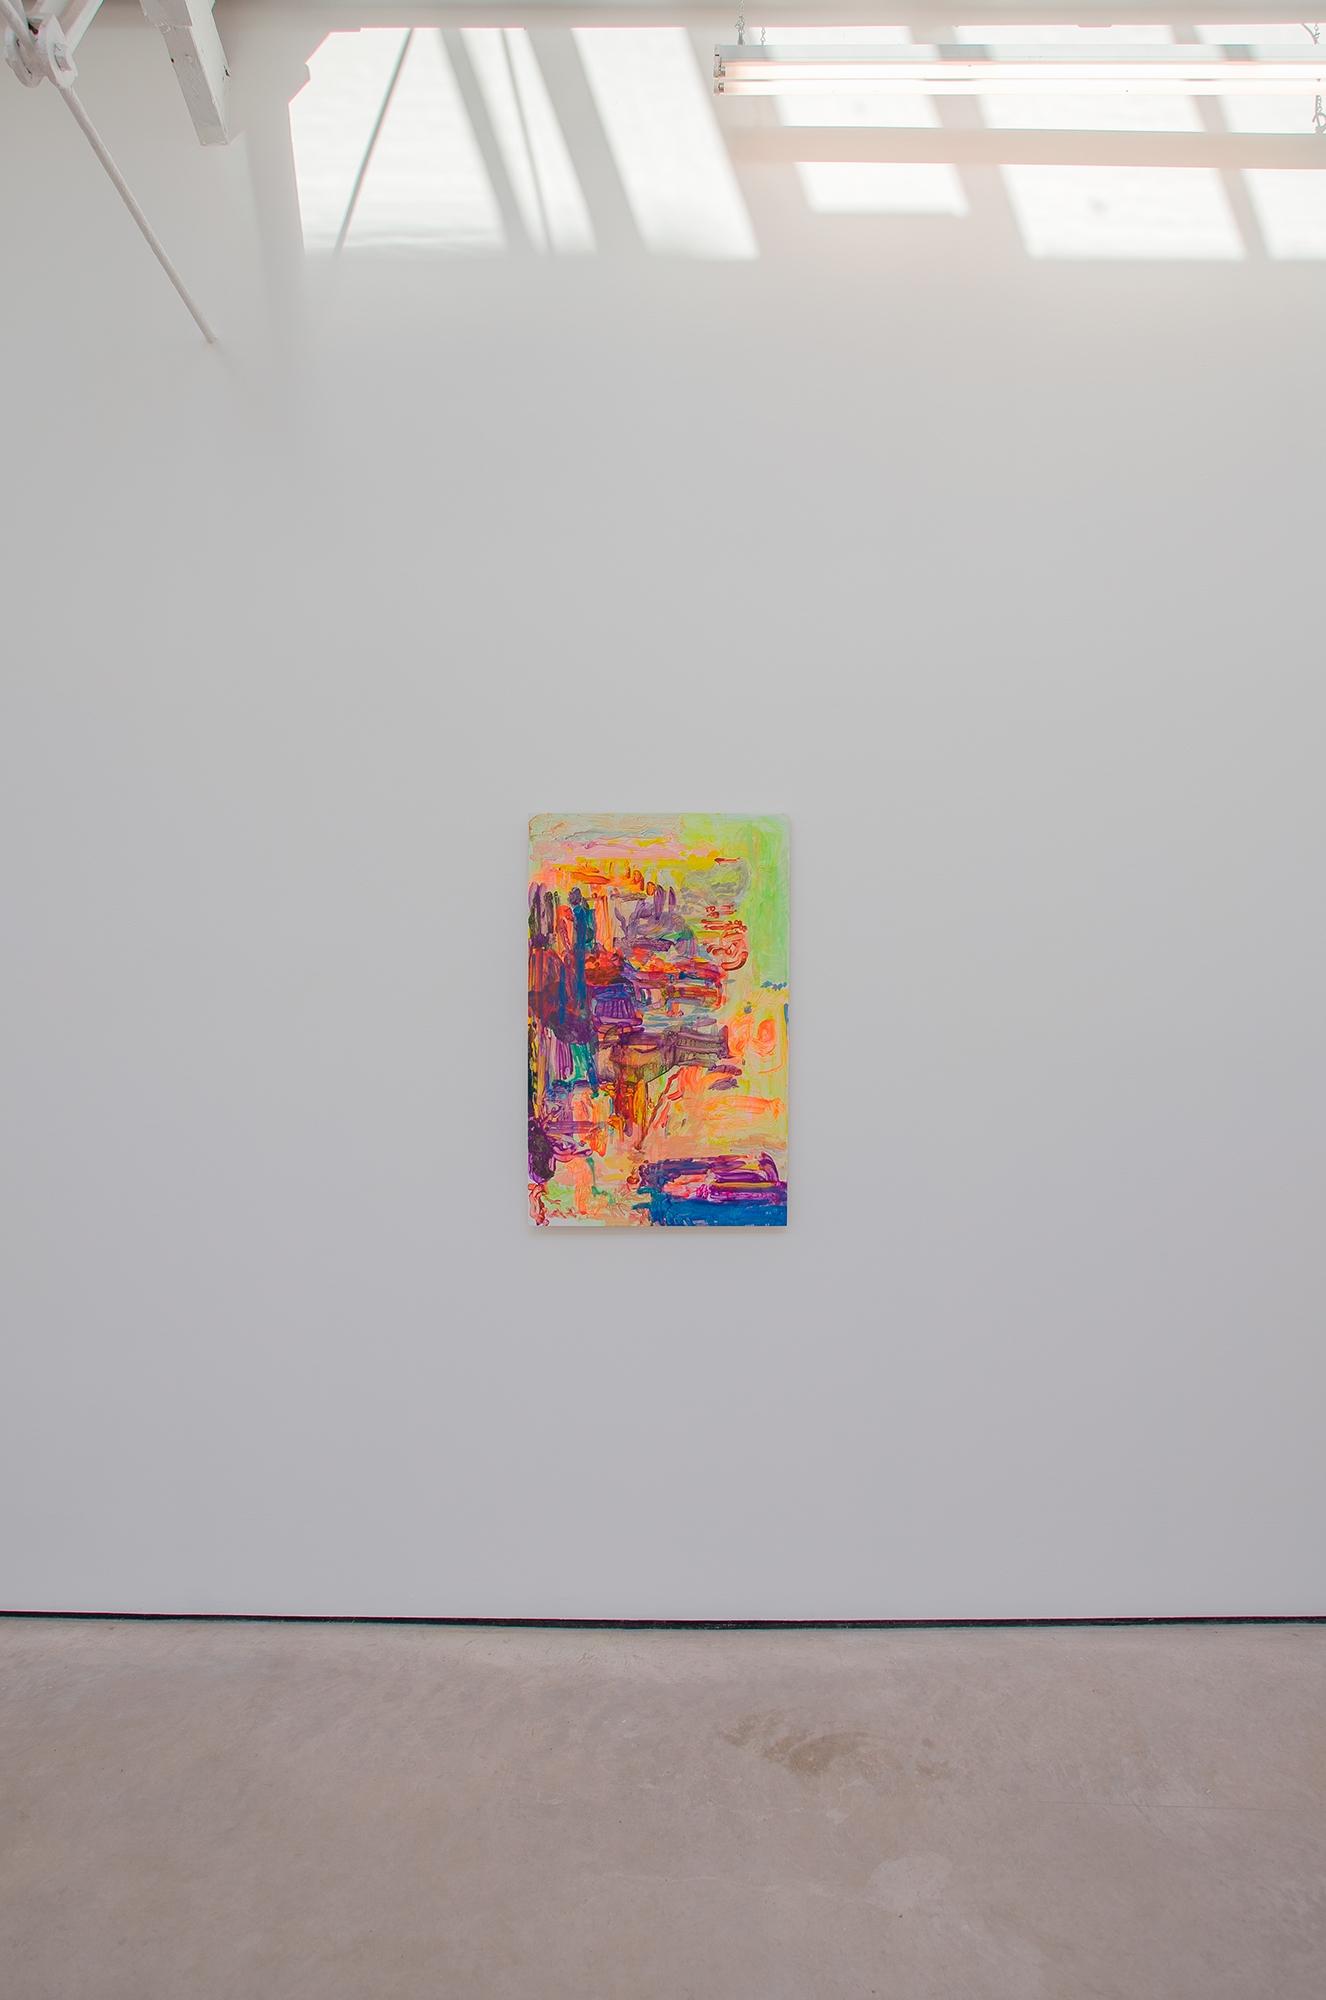 Yellow Politic, 2020, Acrylic on gesso board, 100 x 63 x 3 cm, 39 3/8 x 24 3/4 x 1 1/8 in